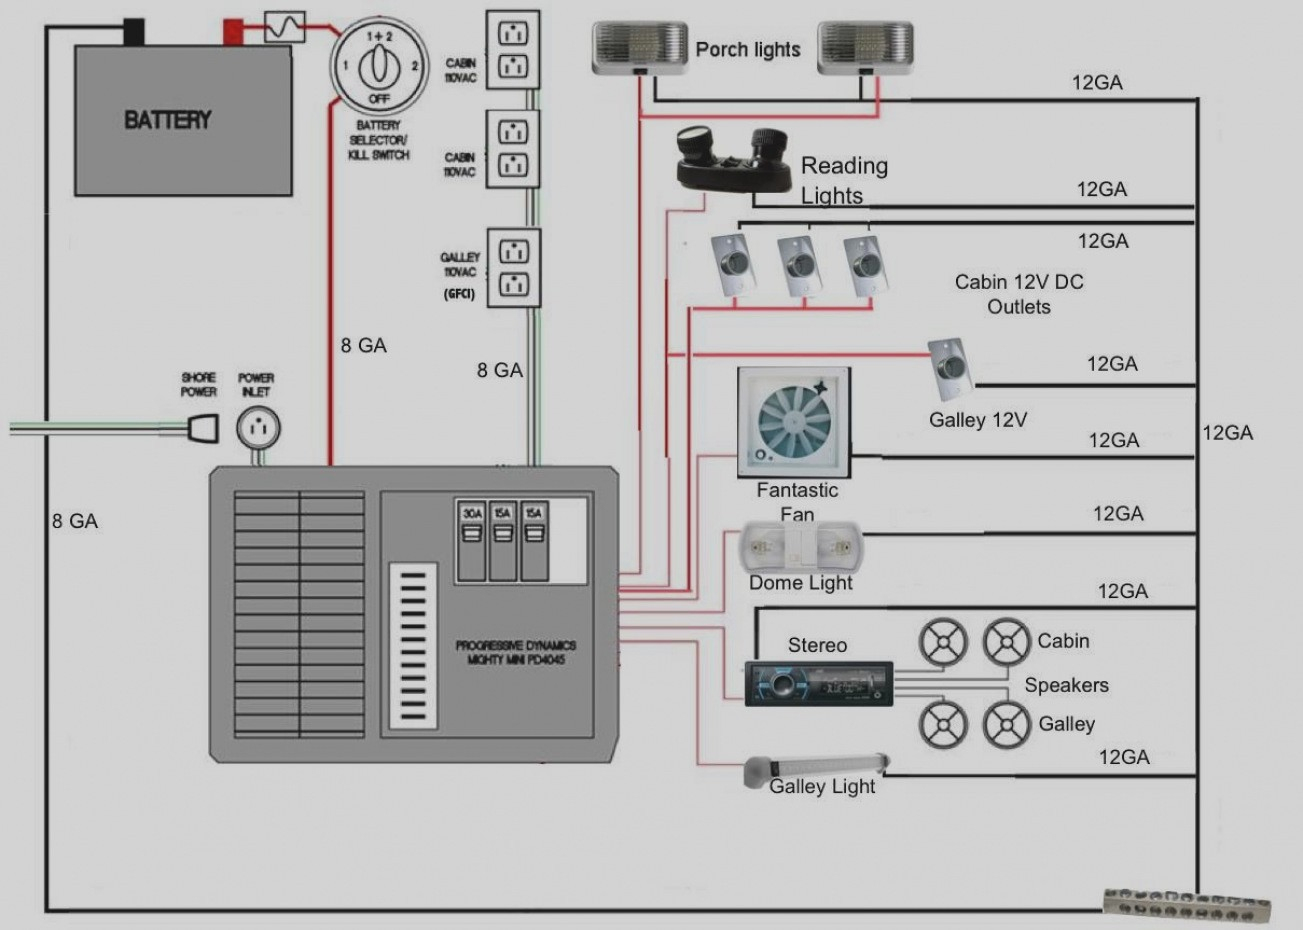 Fantastic Fan Wiring Diagram | Manual E-Books - Fantastic Fan Wiring Diagram